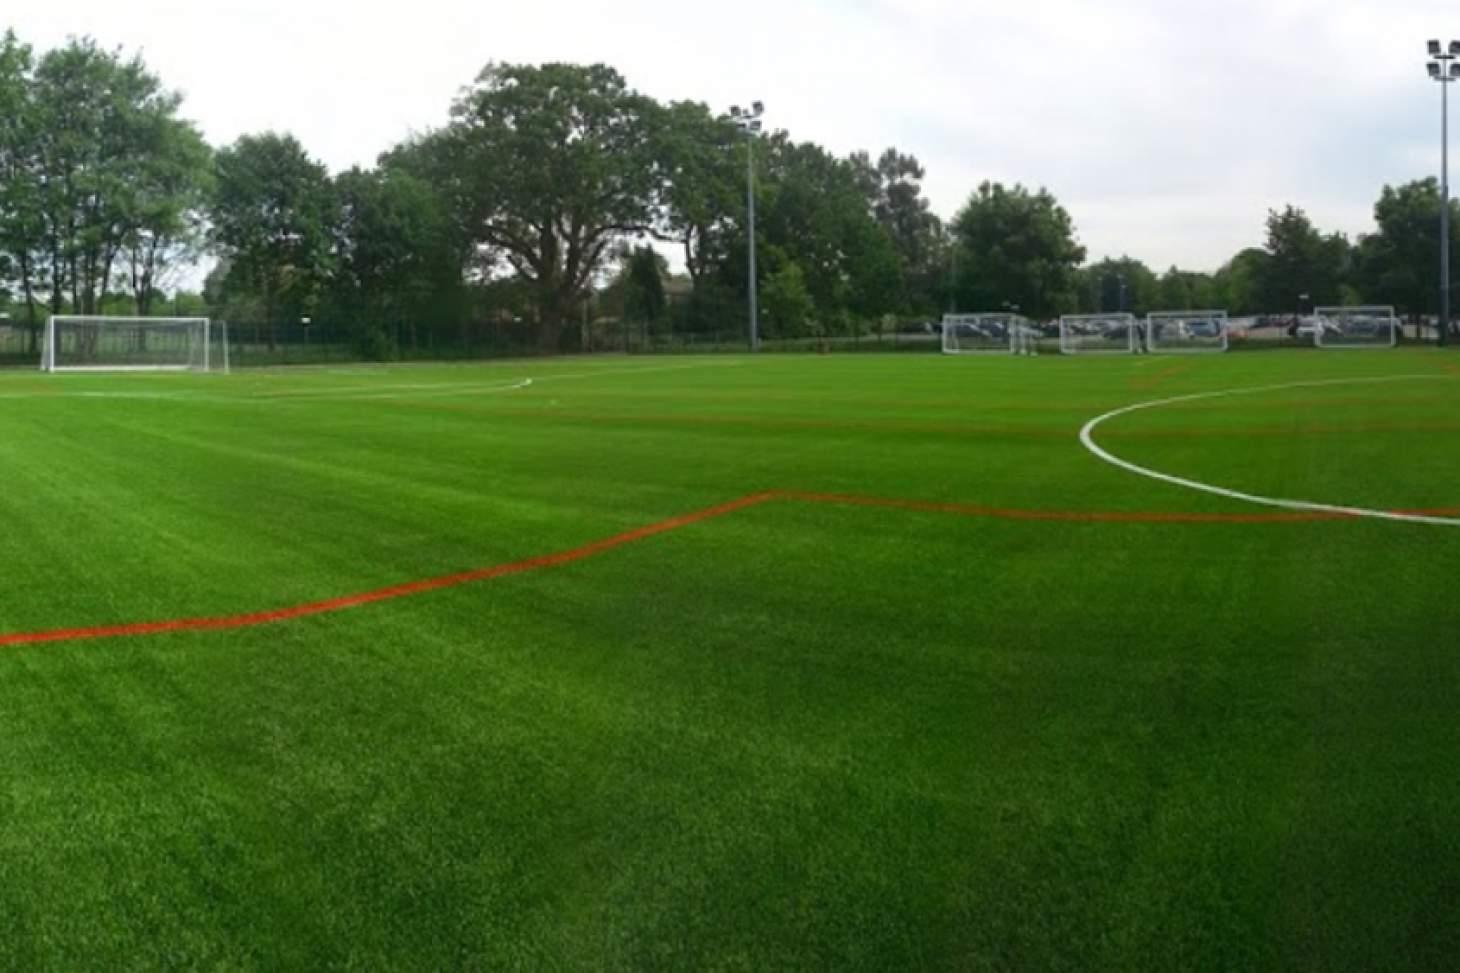 PlayFootball Bracknell 6 a side | 3G Astroturf football pitch